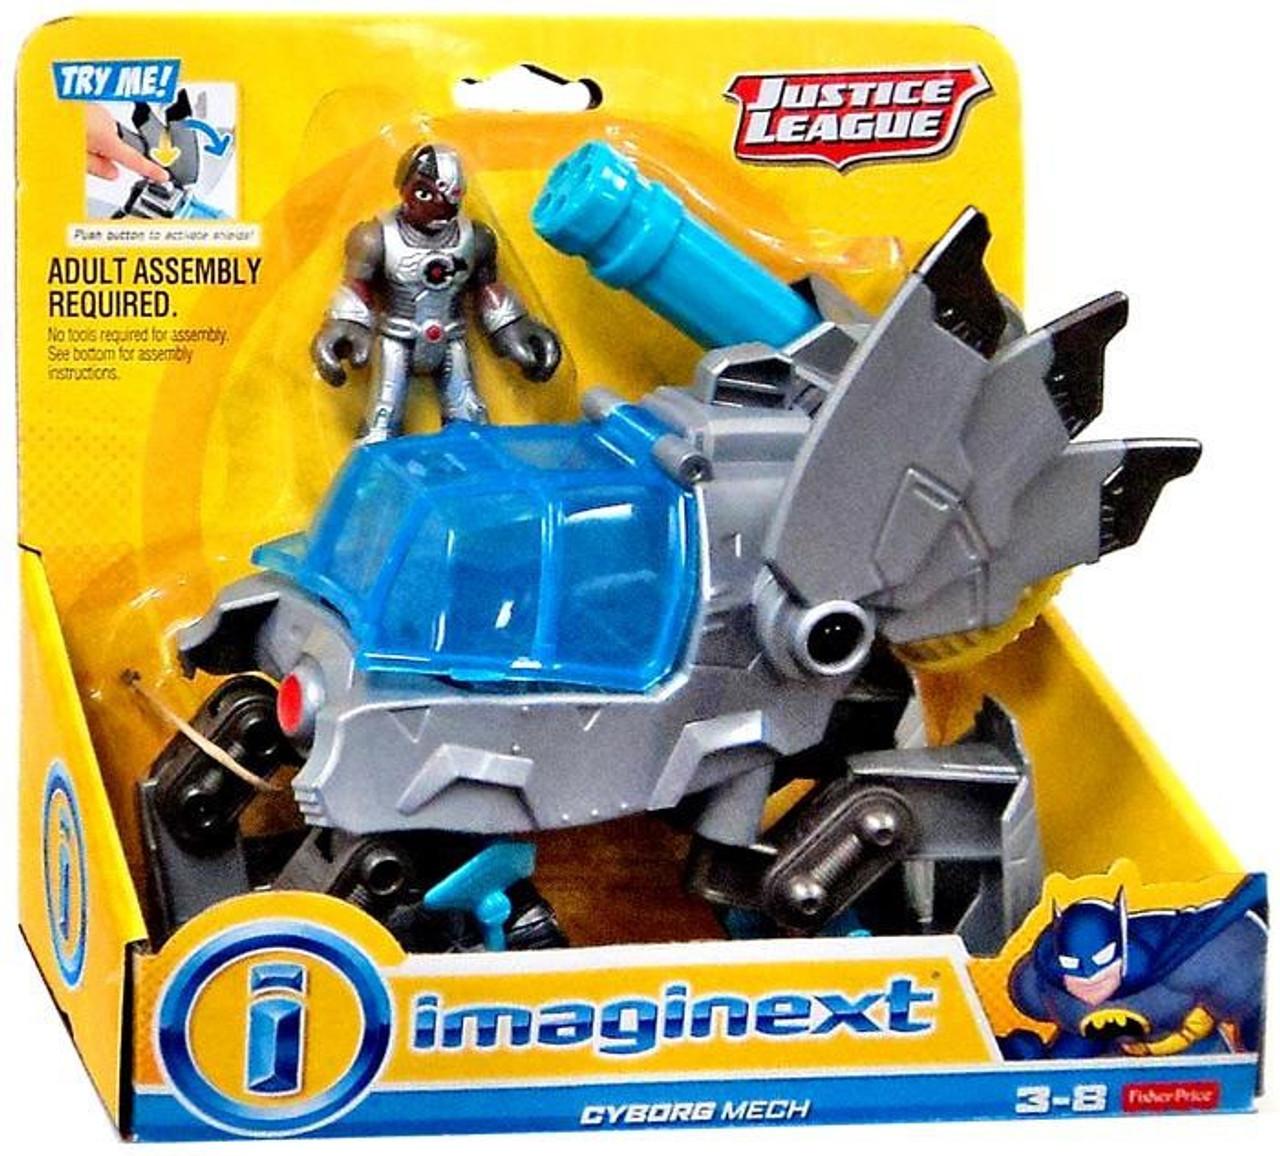 Fisher Price DC Justice League Imaginext Cyborg Mech Exclusive Mini Figure Set